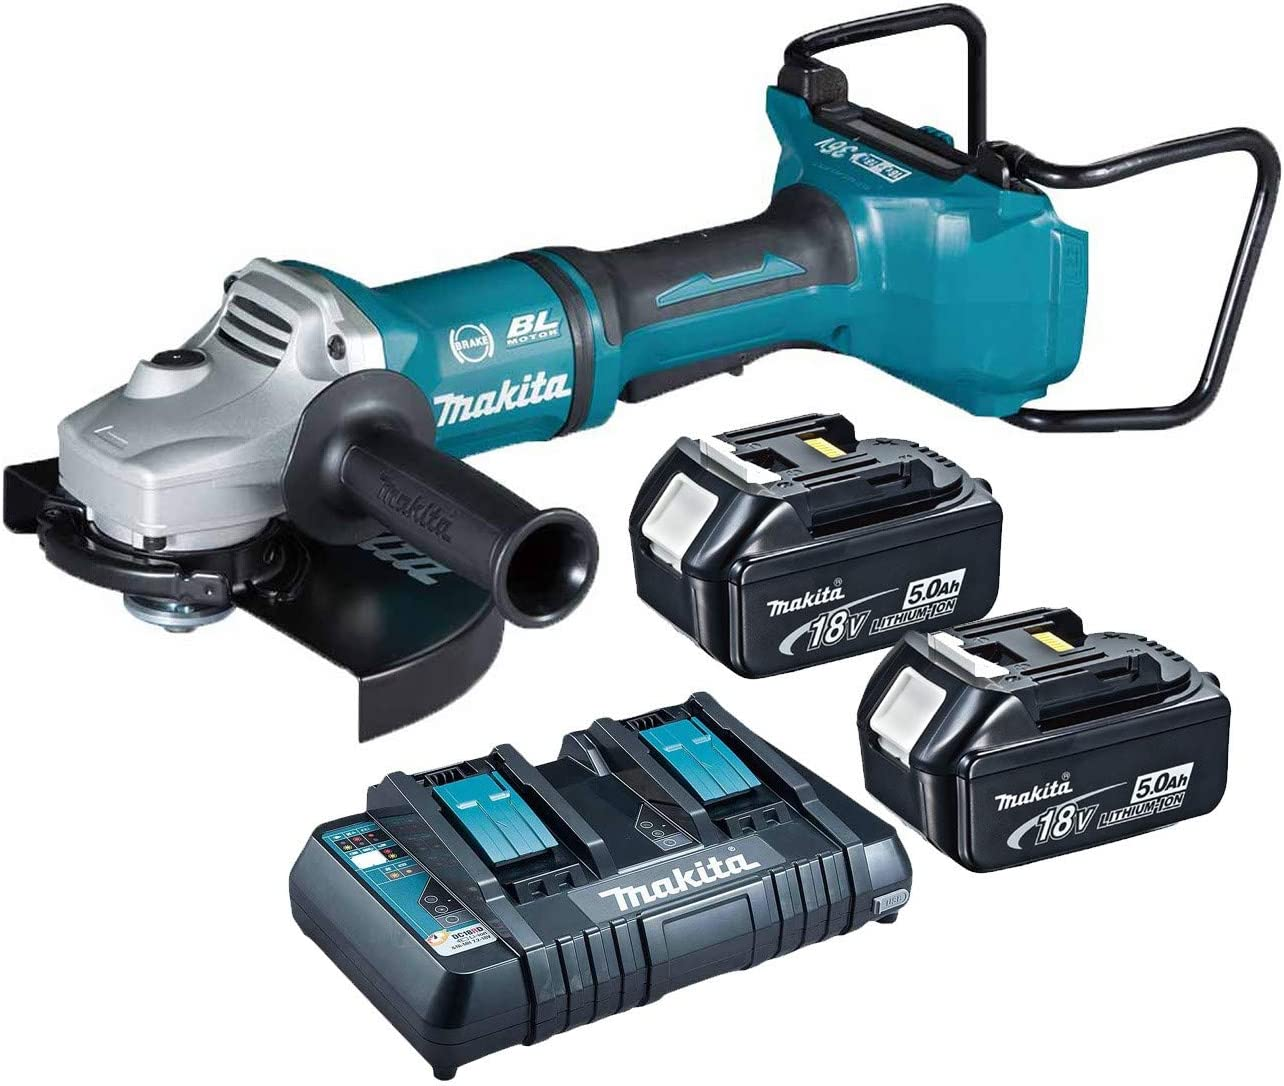 valise Makita Batterie-angle meuleuse dga900zkx2 dga900 2x18v 36 V 230 mm Ezynut